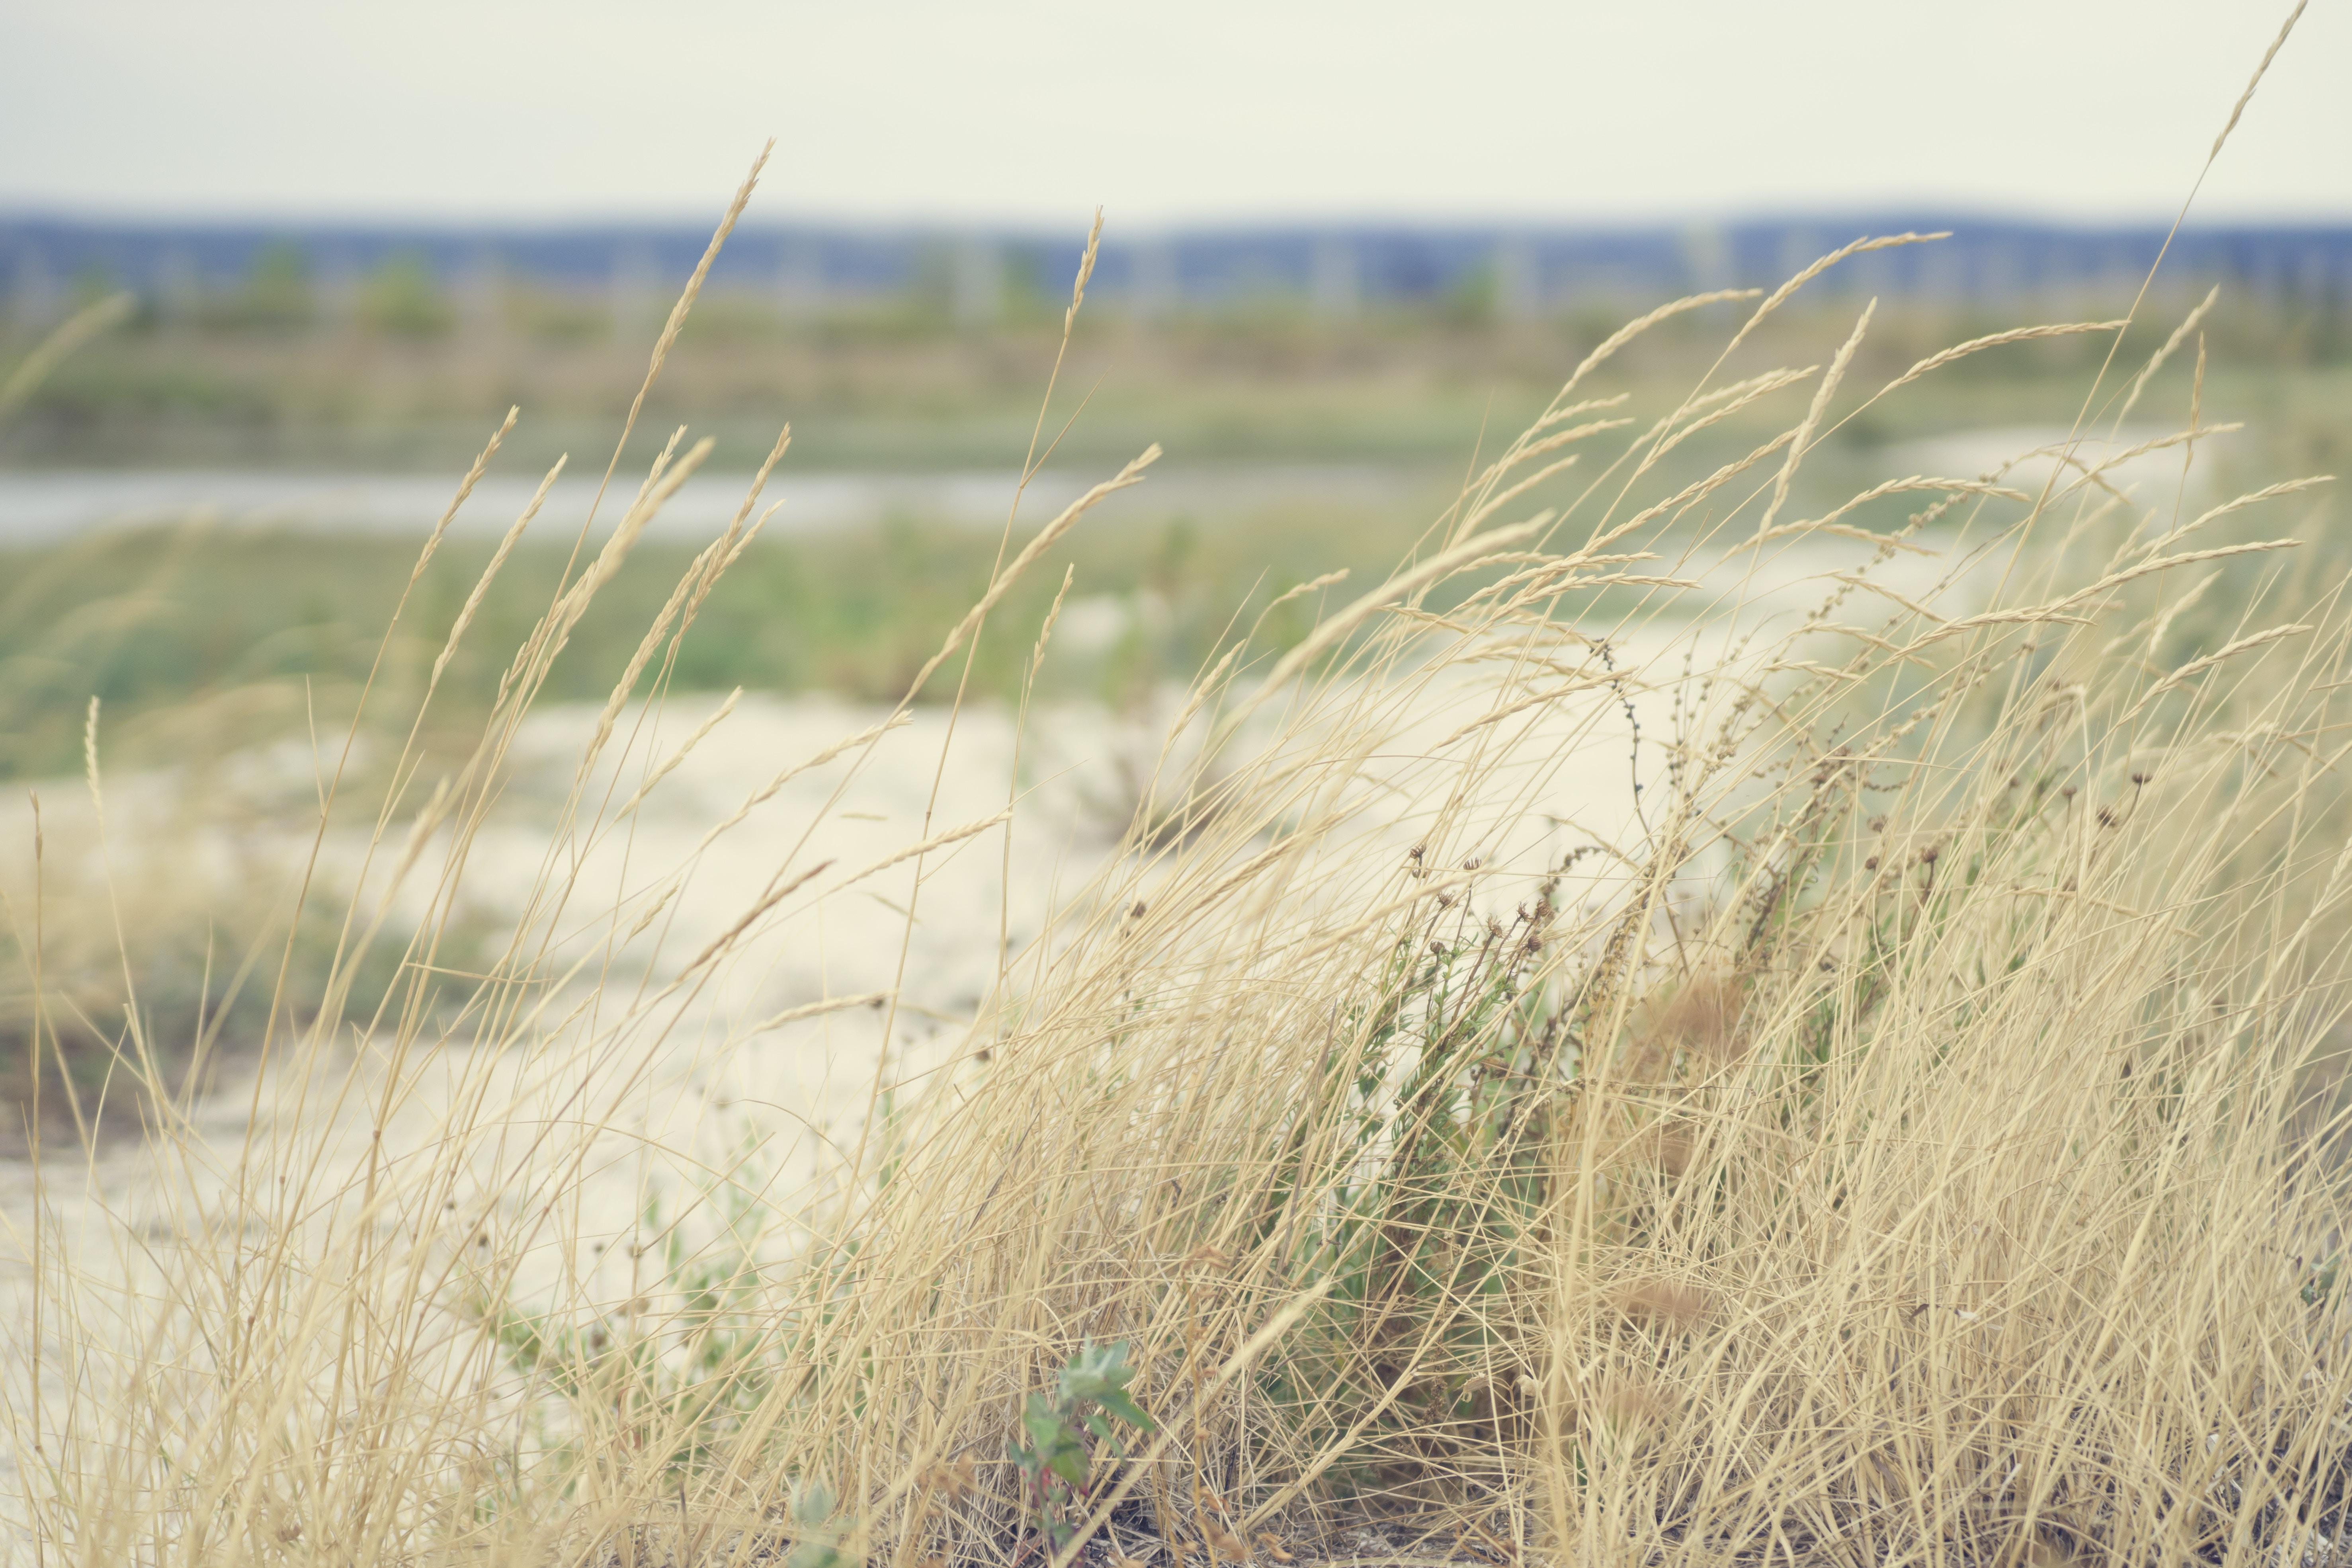 Long grass blows in the wind in prairie landscape